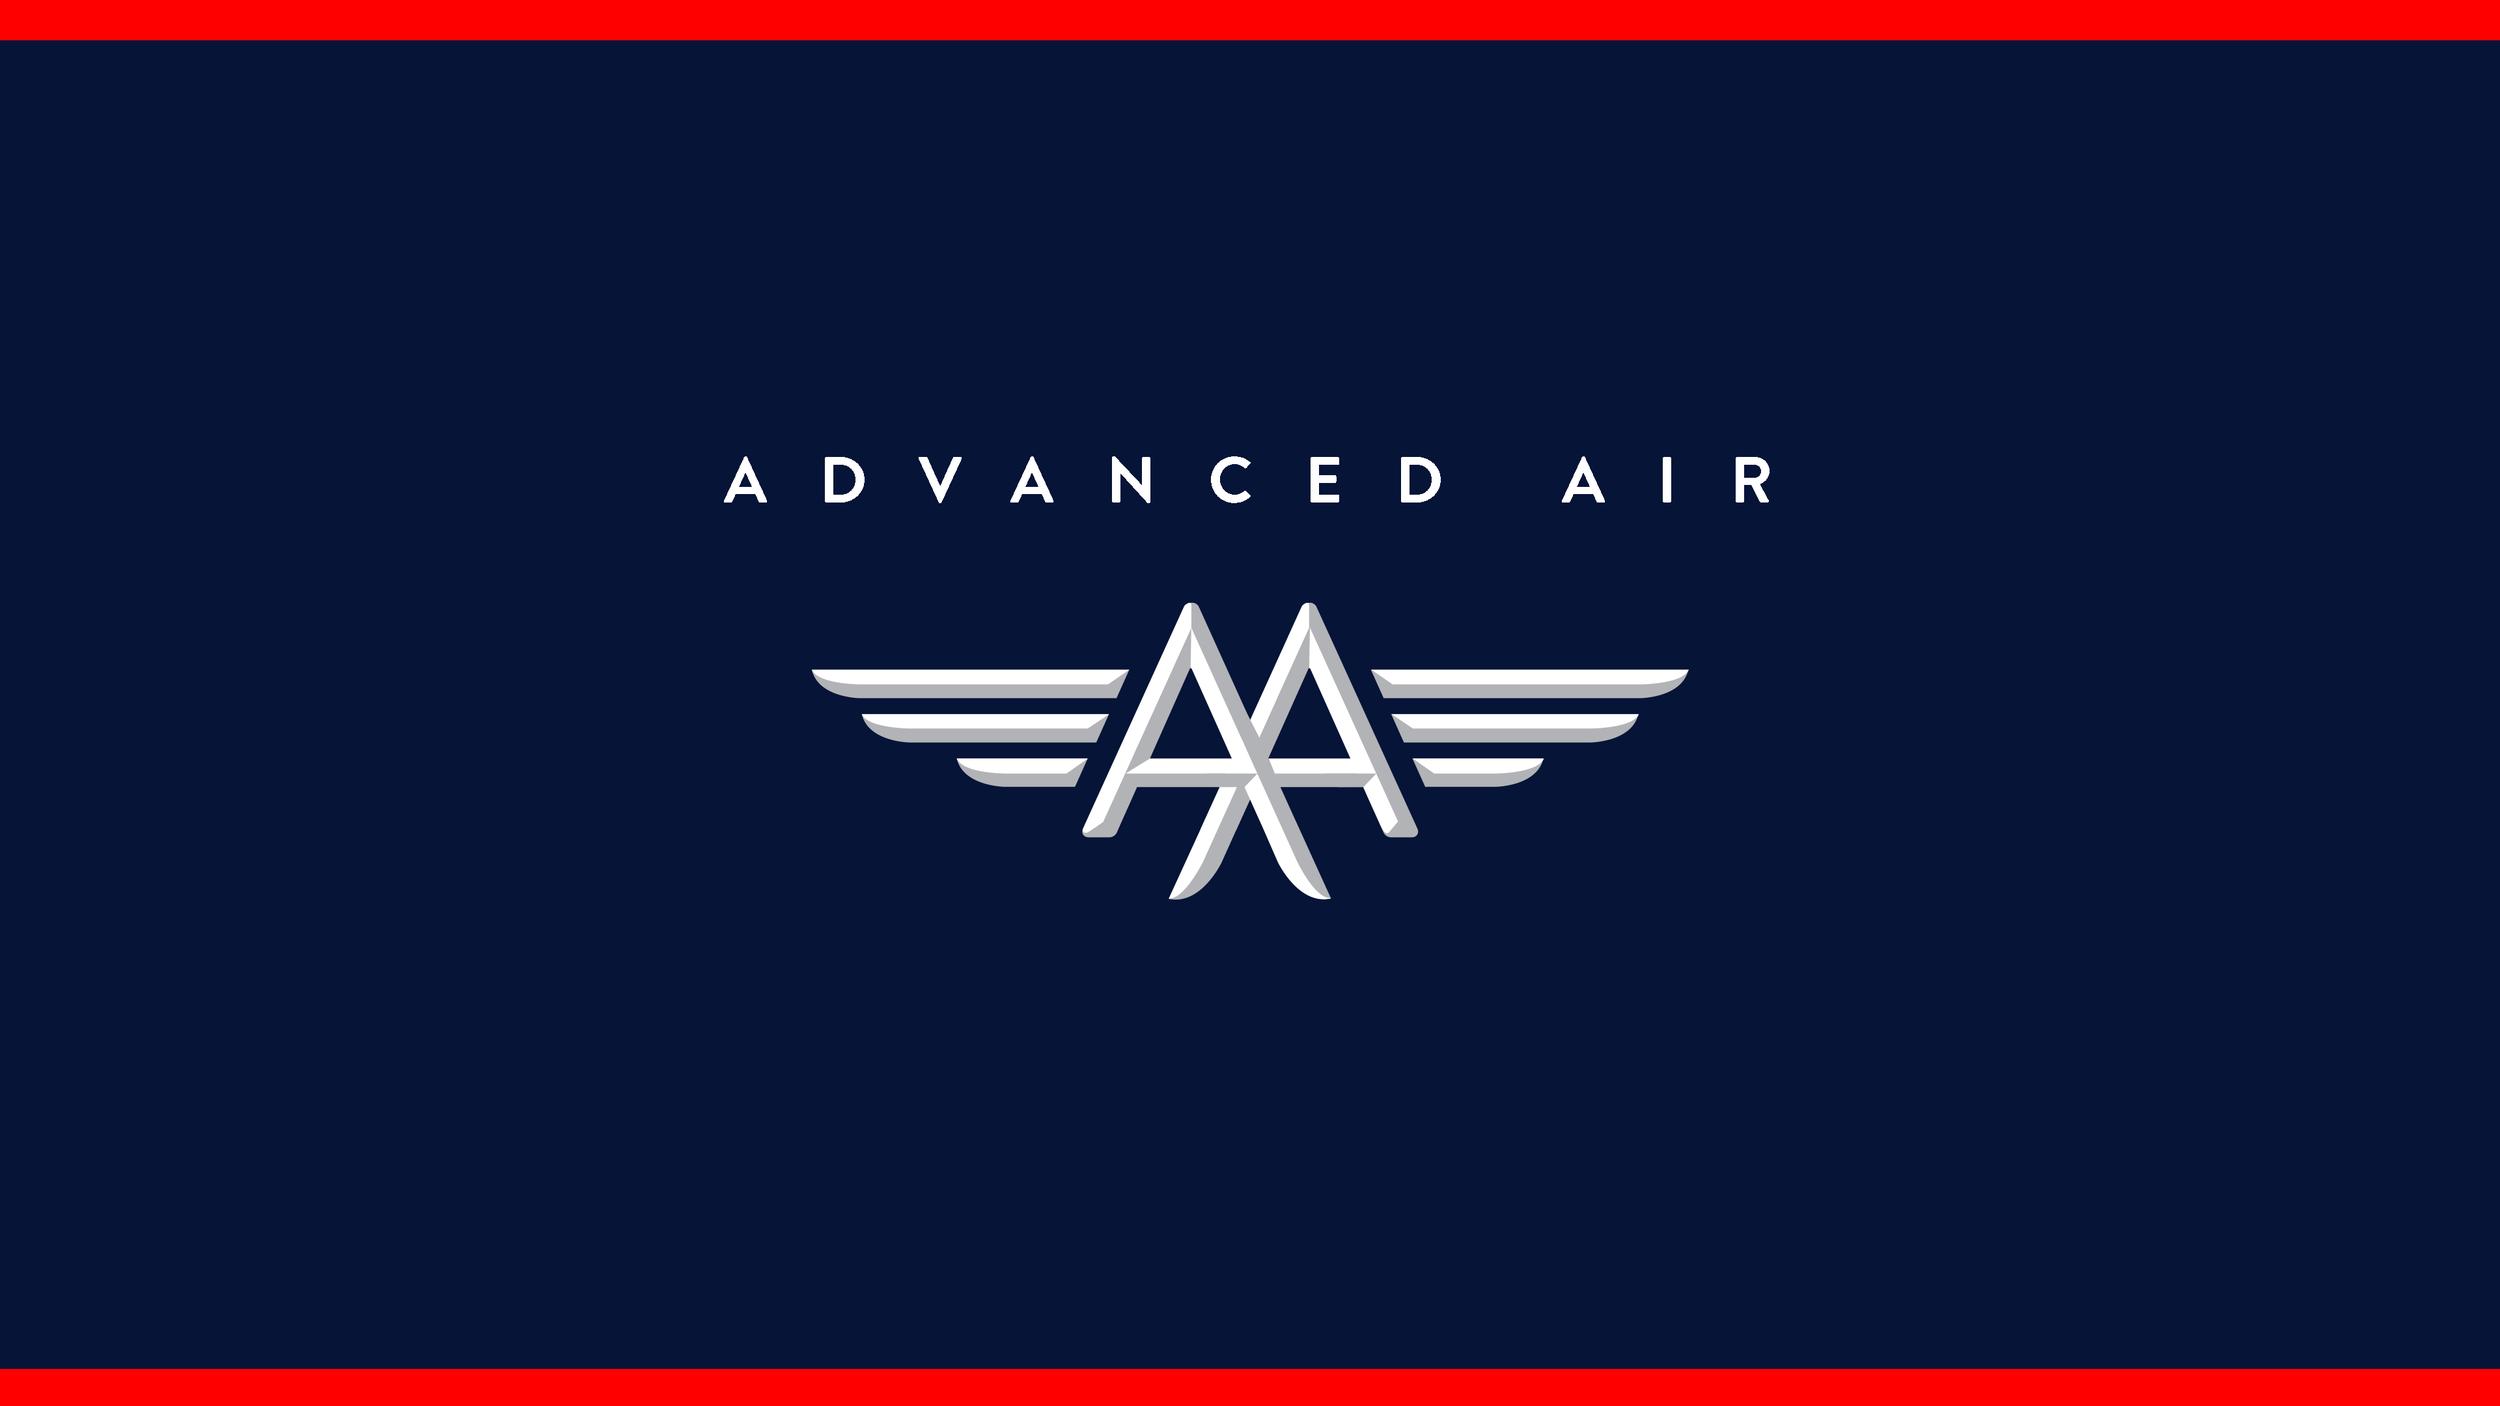 AA Logo 4k.png